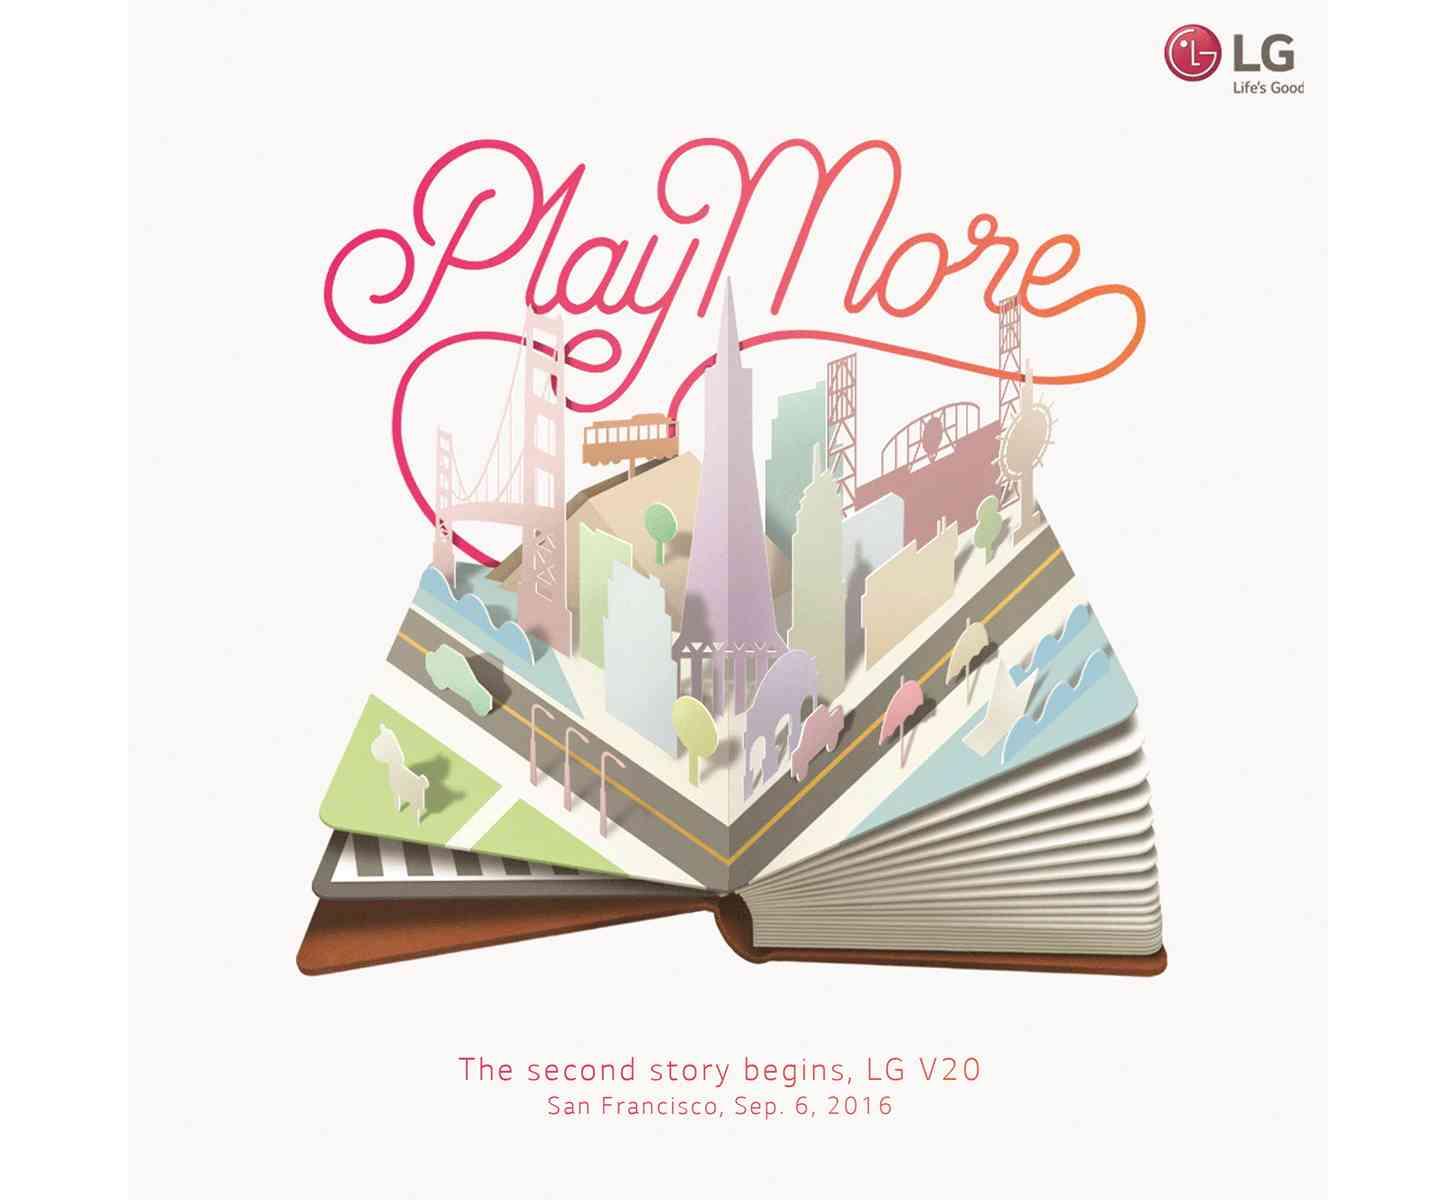 LG V20 event invitation